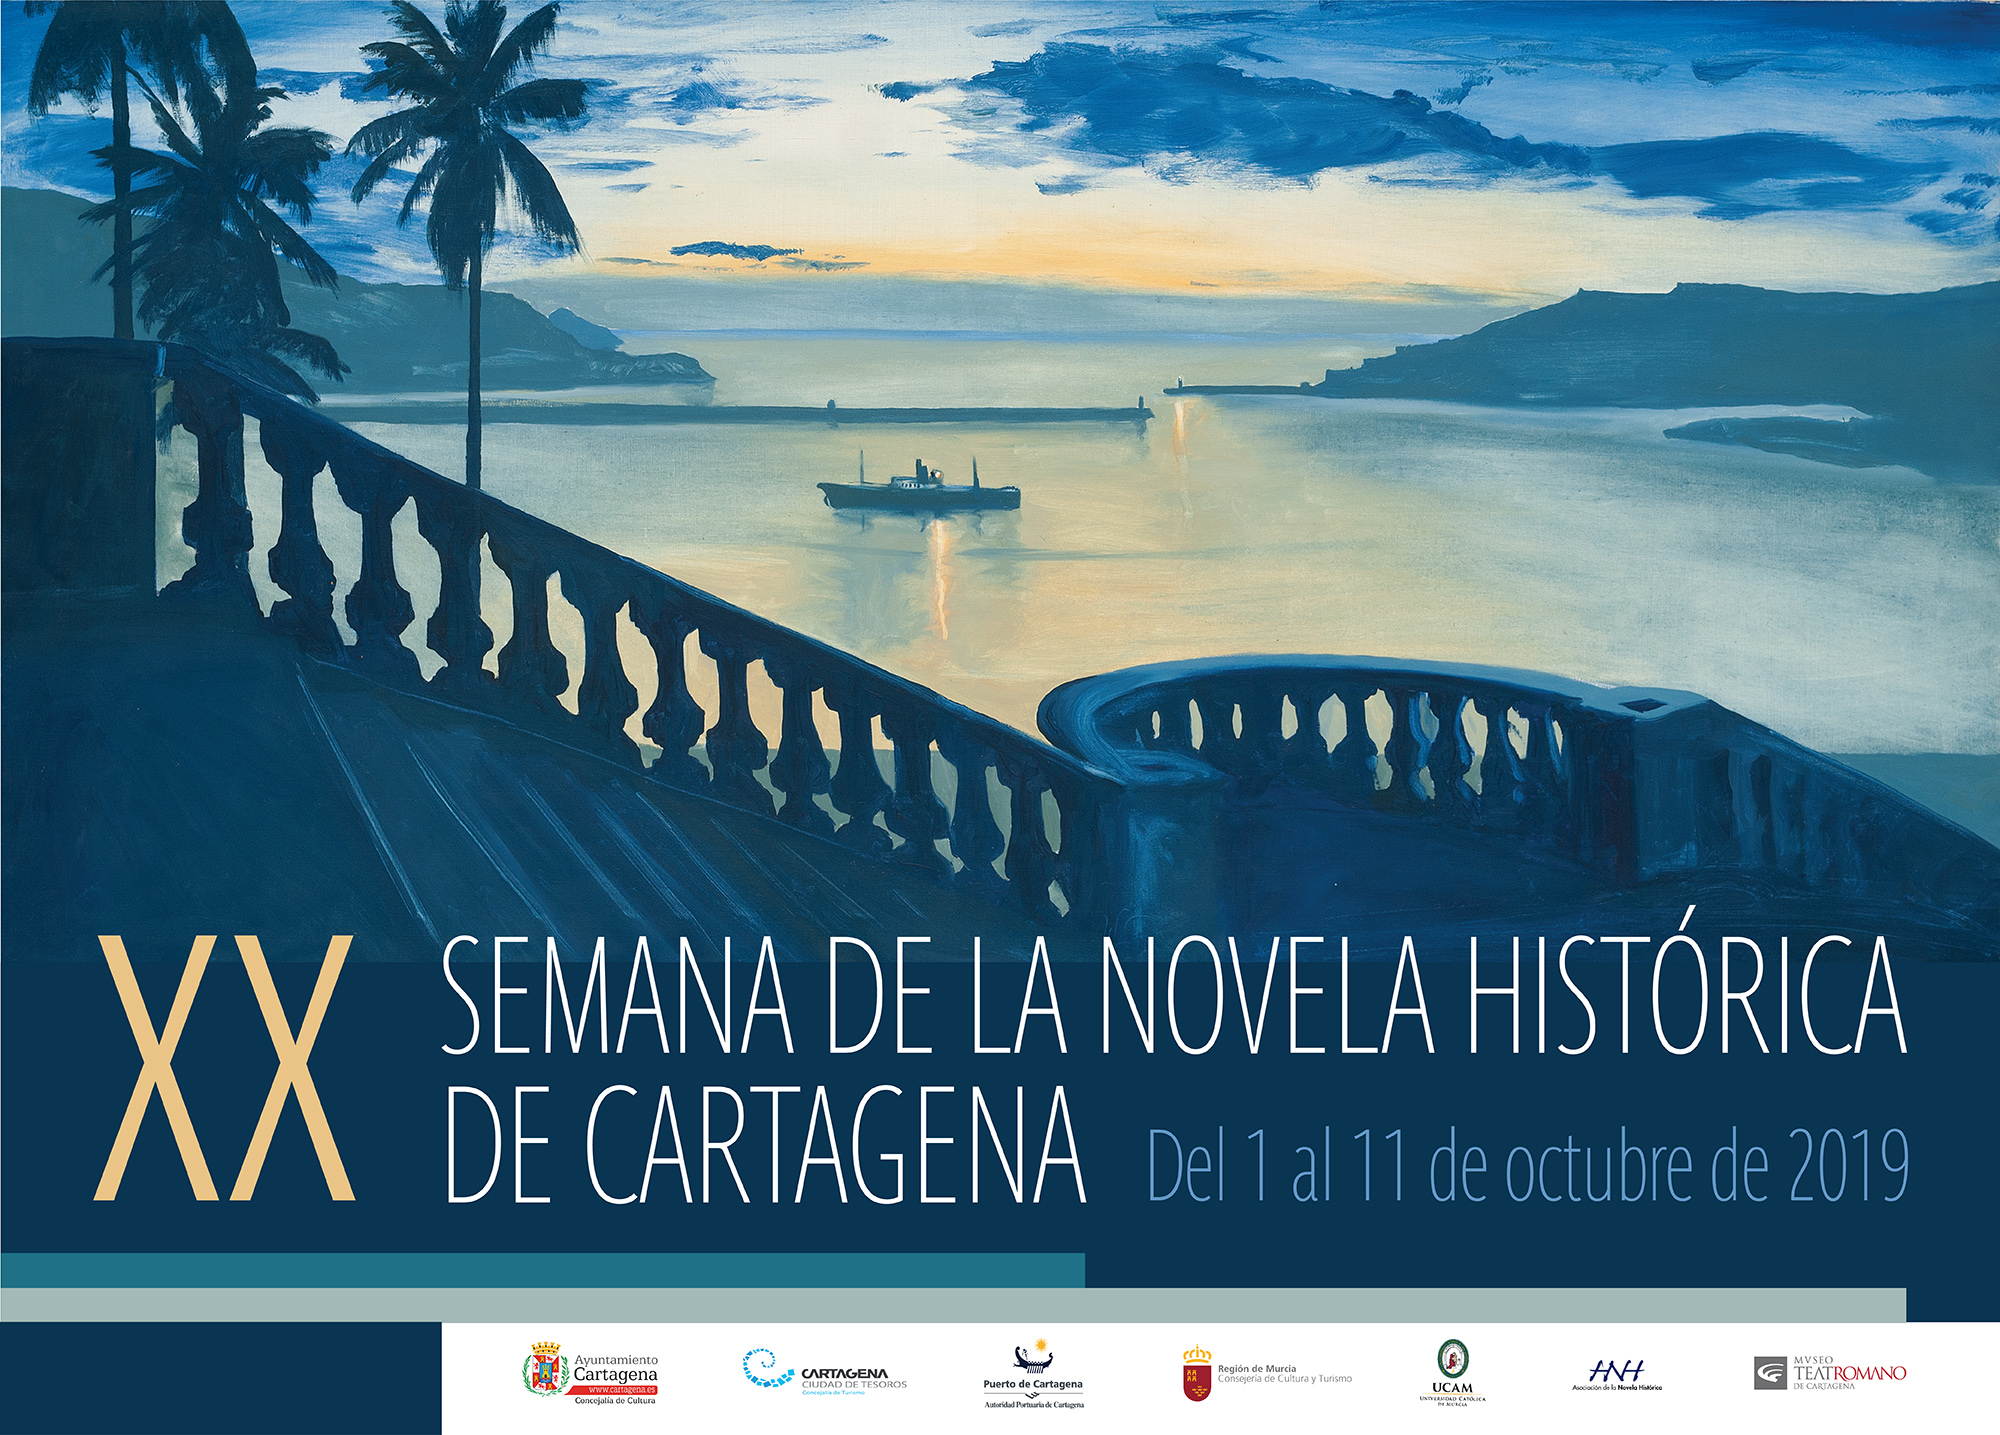 XX Semana de la Novela Histórica de Cartagena